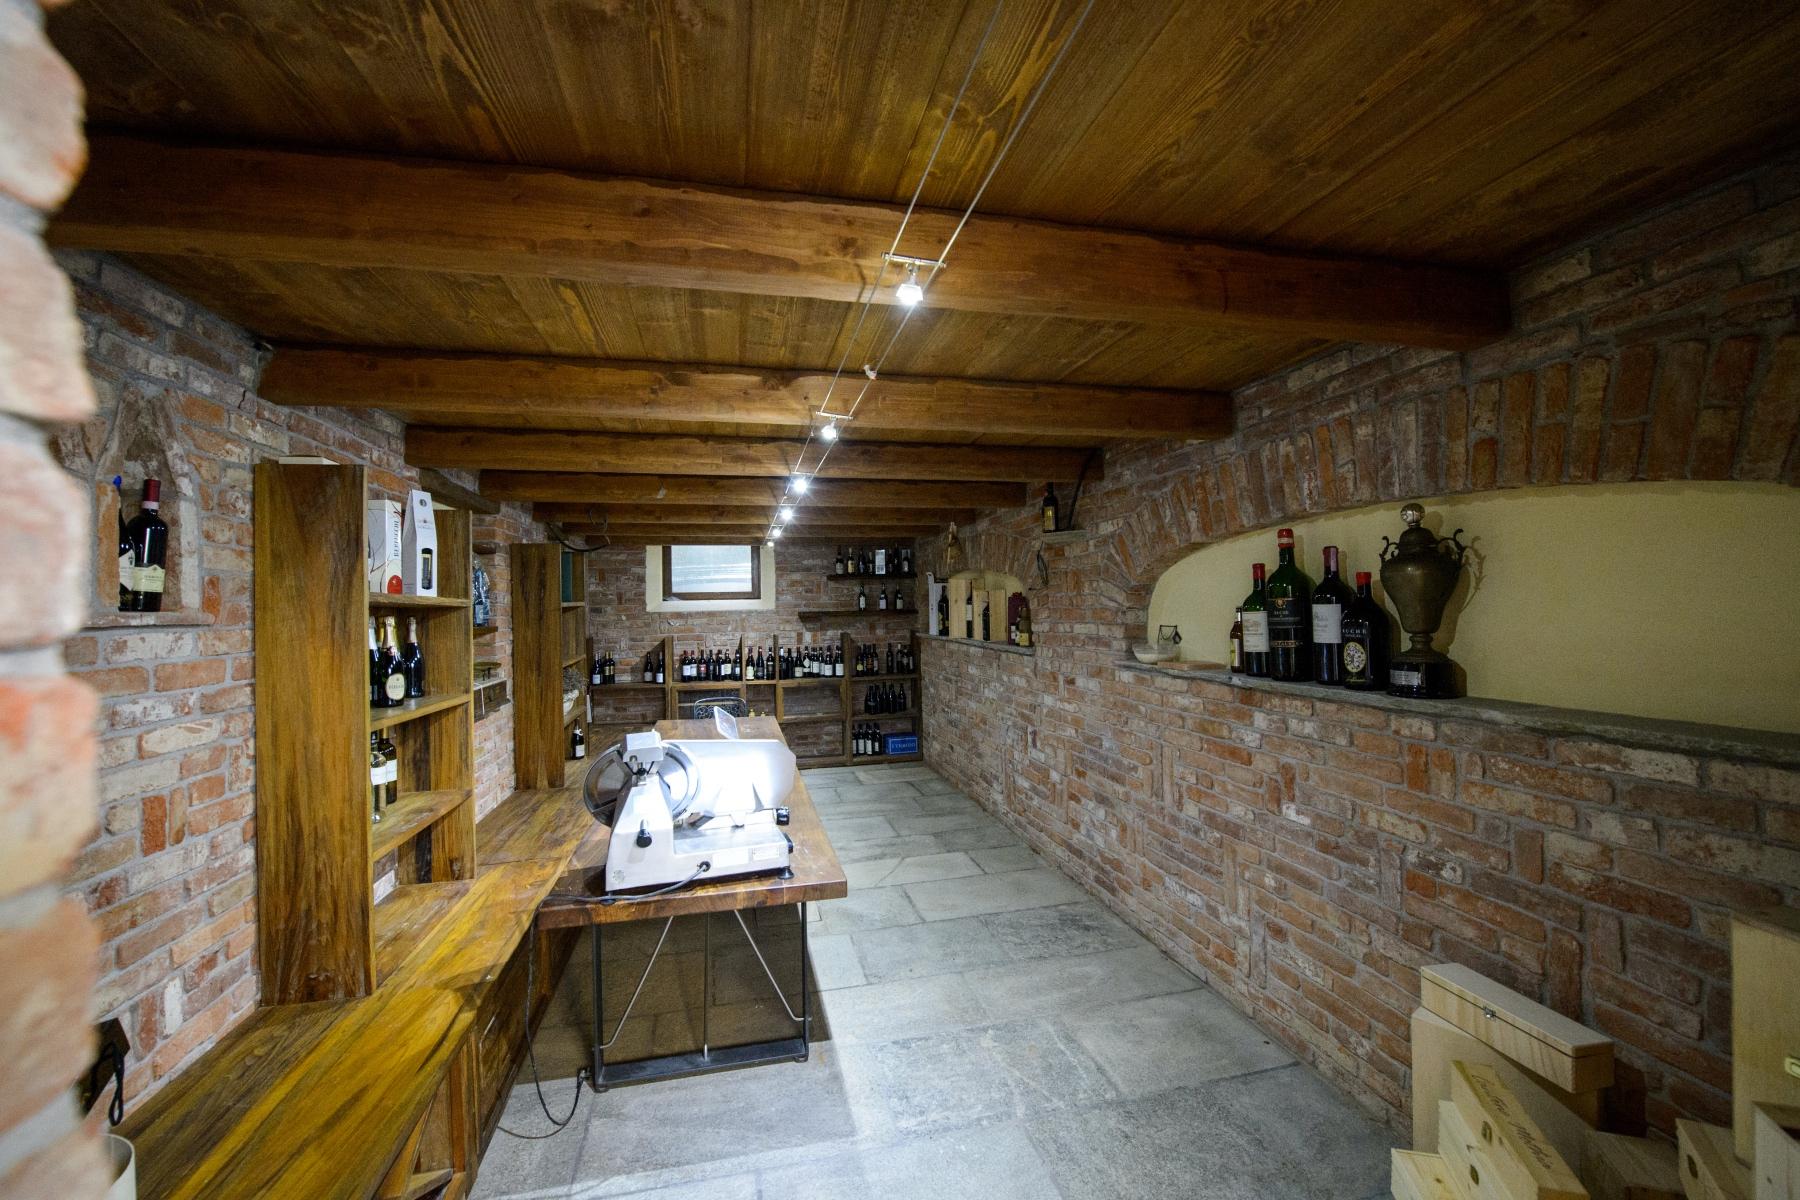 Casa indipendente in Vendita a Agrate Conturbia: 5 locali, 400 mq - Foto 18